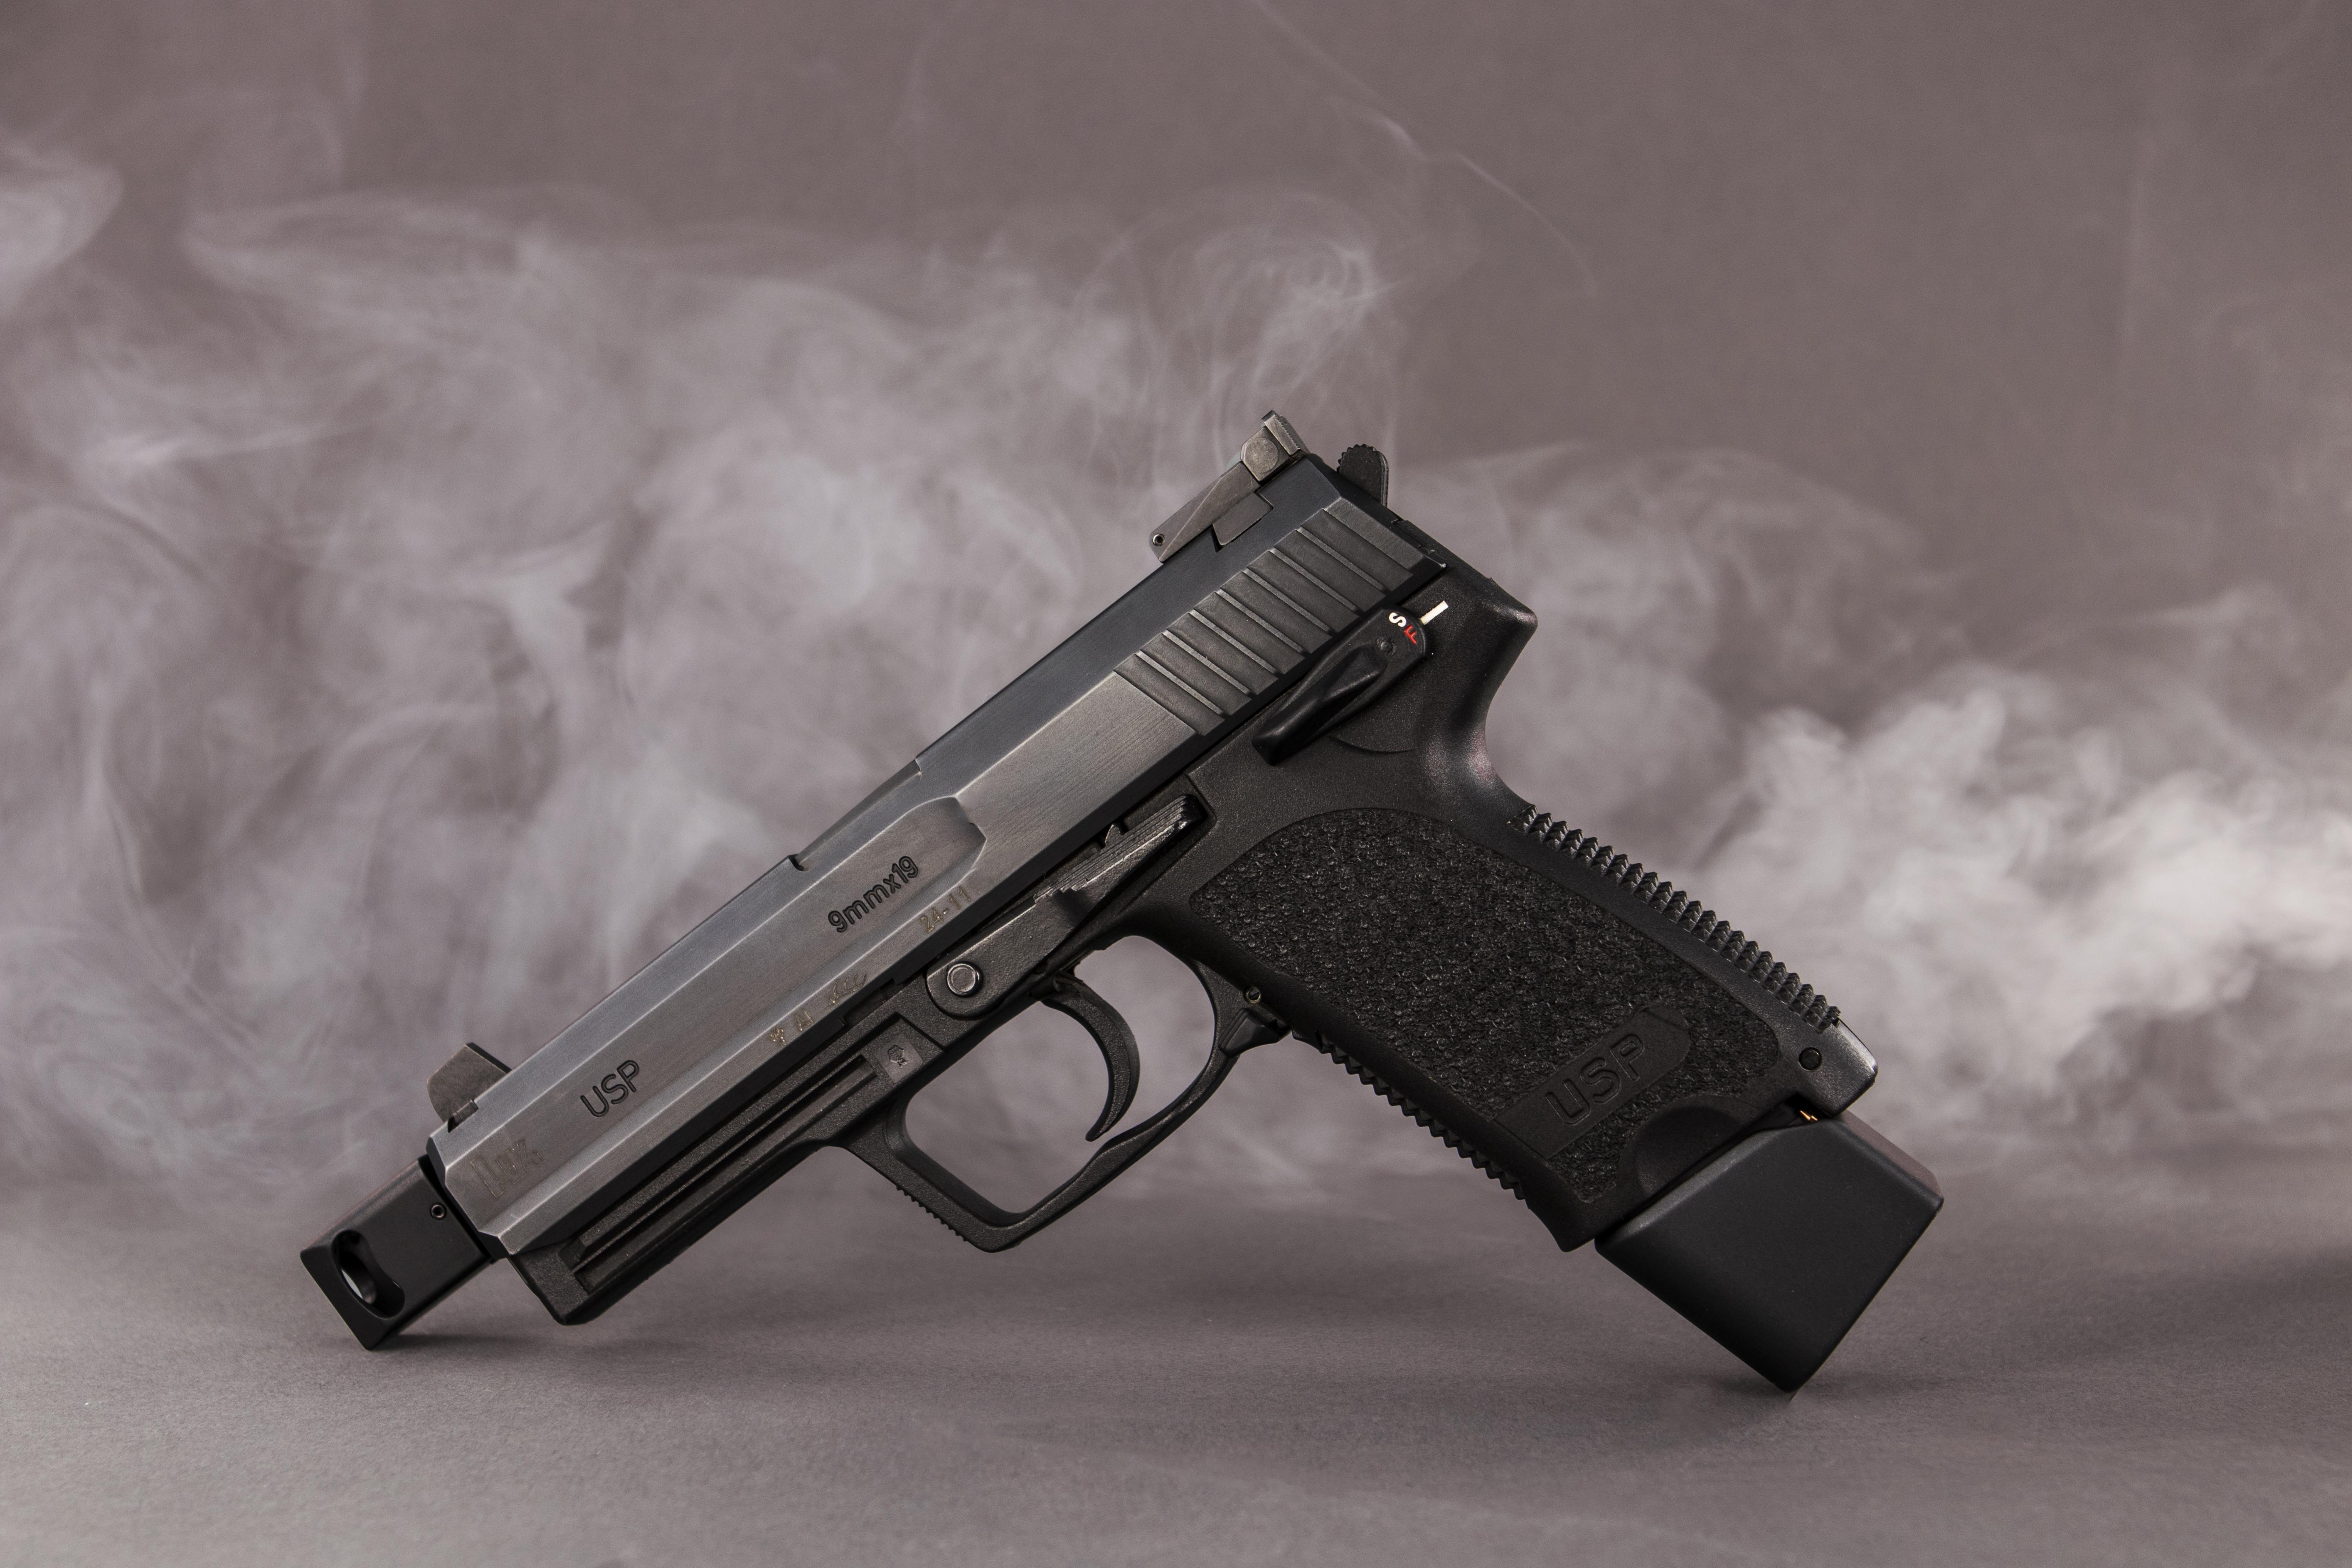 NEW!! USP 9mm - +5 Magazine Extension-img_6427.jpg